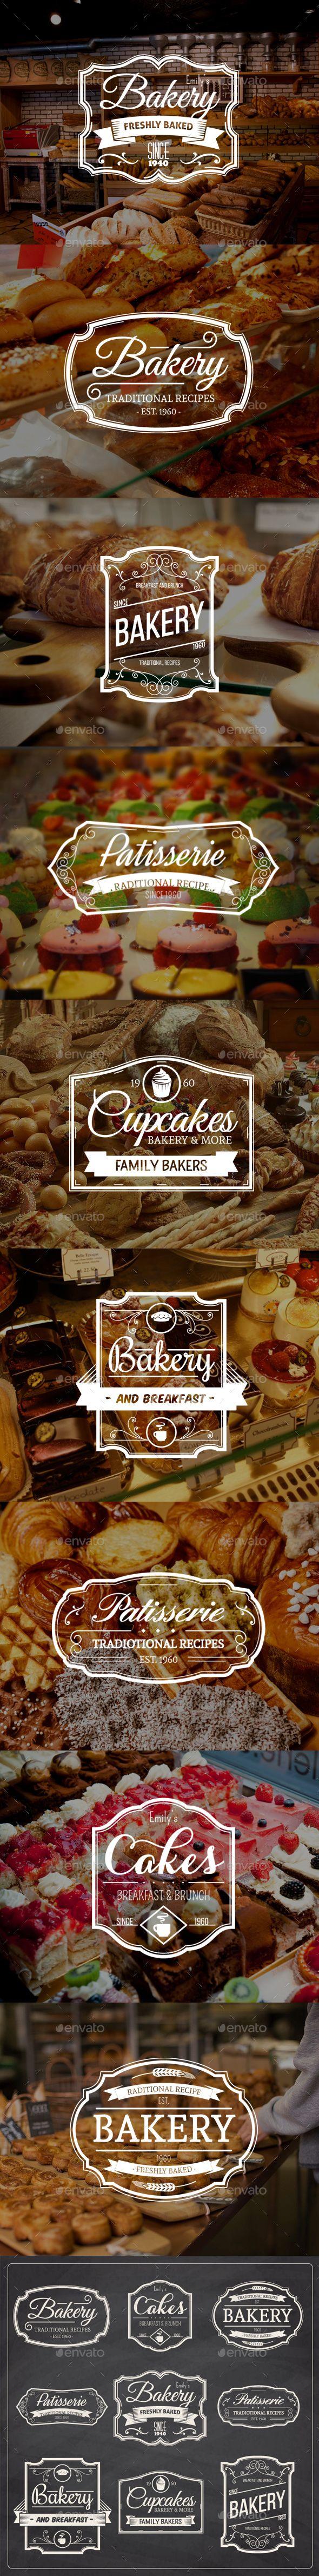 9 Vintage Bakery Badges Template Vector EPS, AI. Download here: http://graphicriver.net/item/9-vintage-bakery-badges/15810081?ref=ksioks